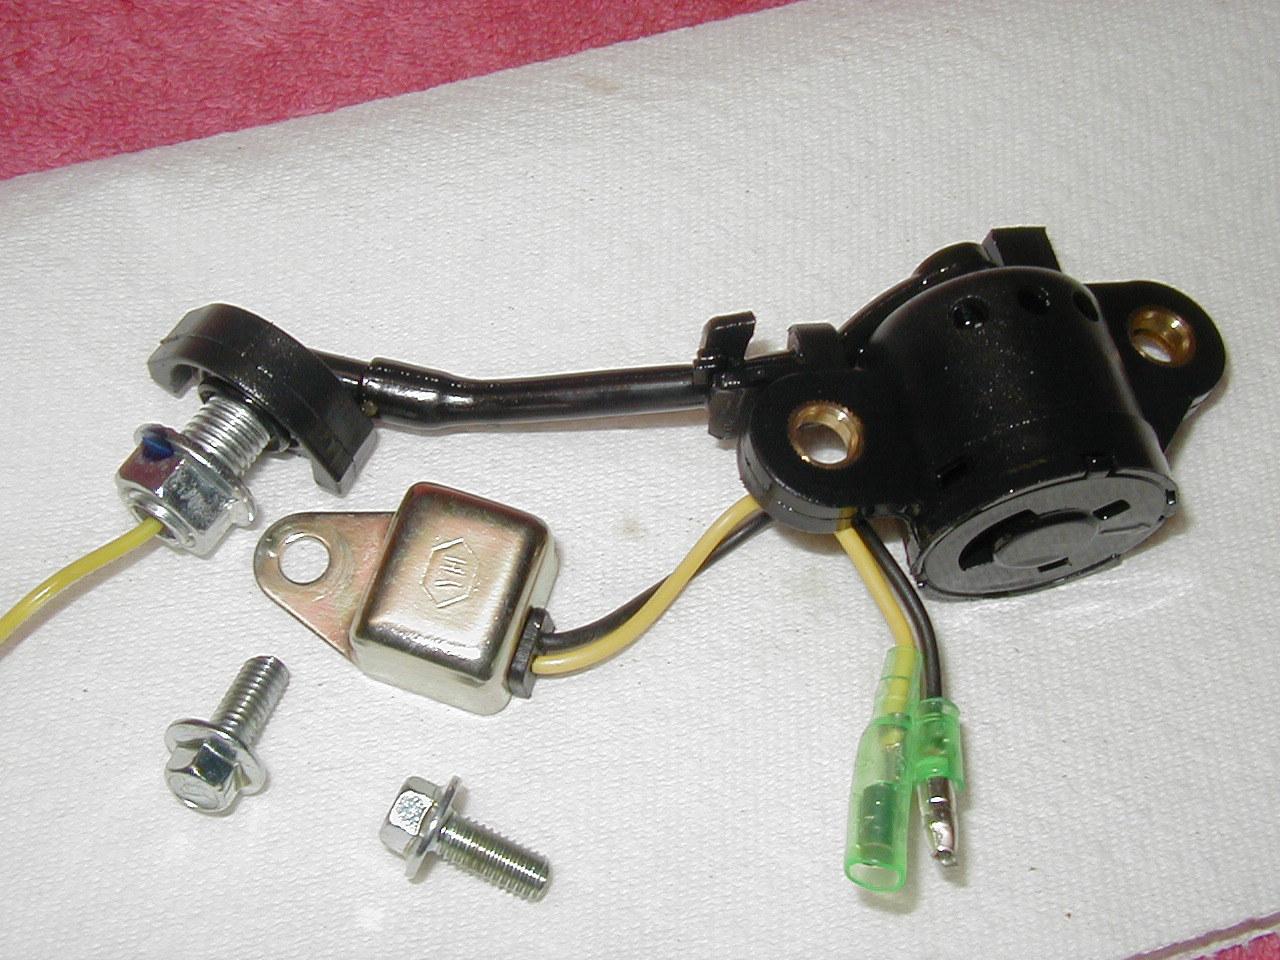 predator 212 cc ohv horizontal shaft gas engine parts low shutdown parts